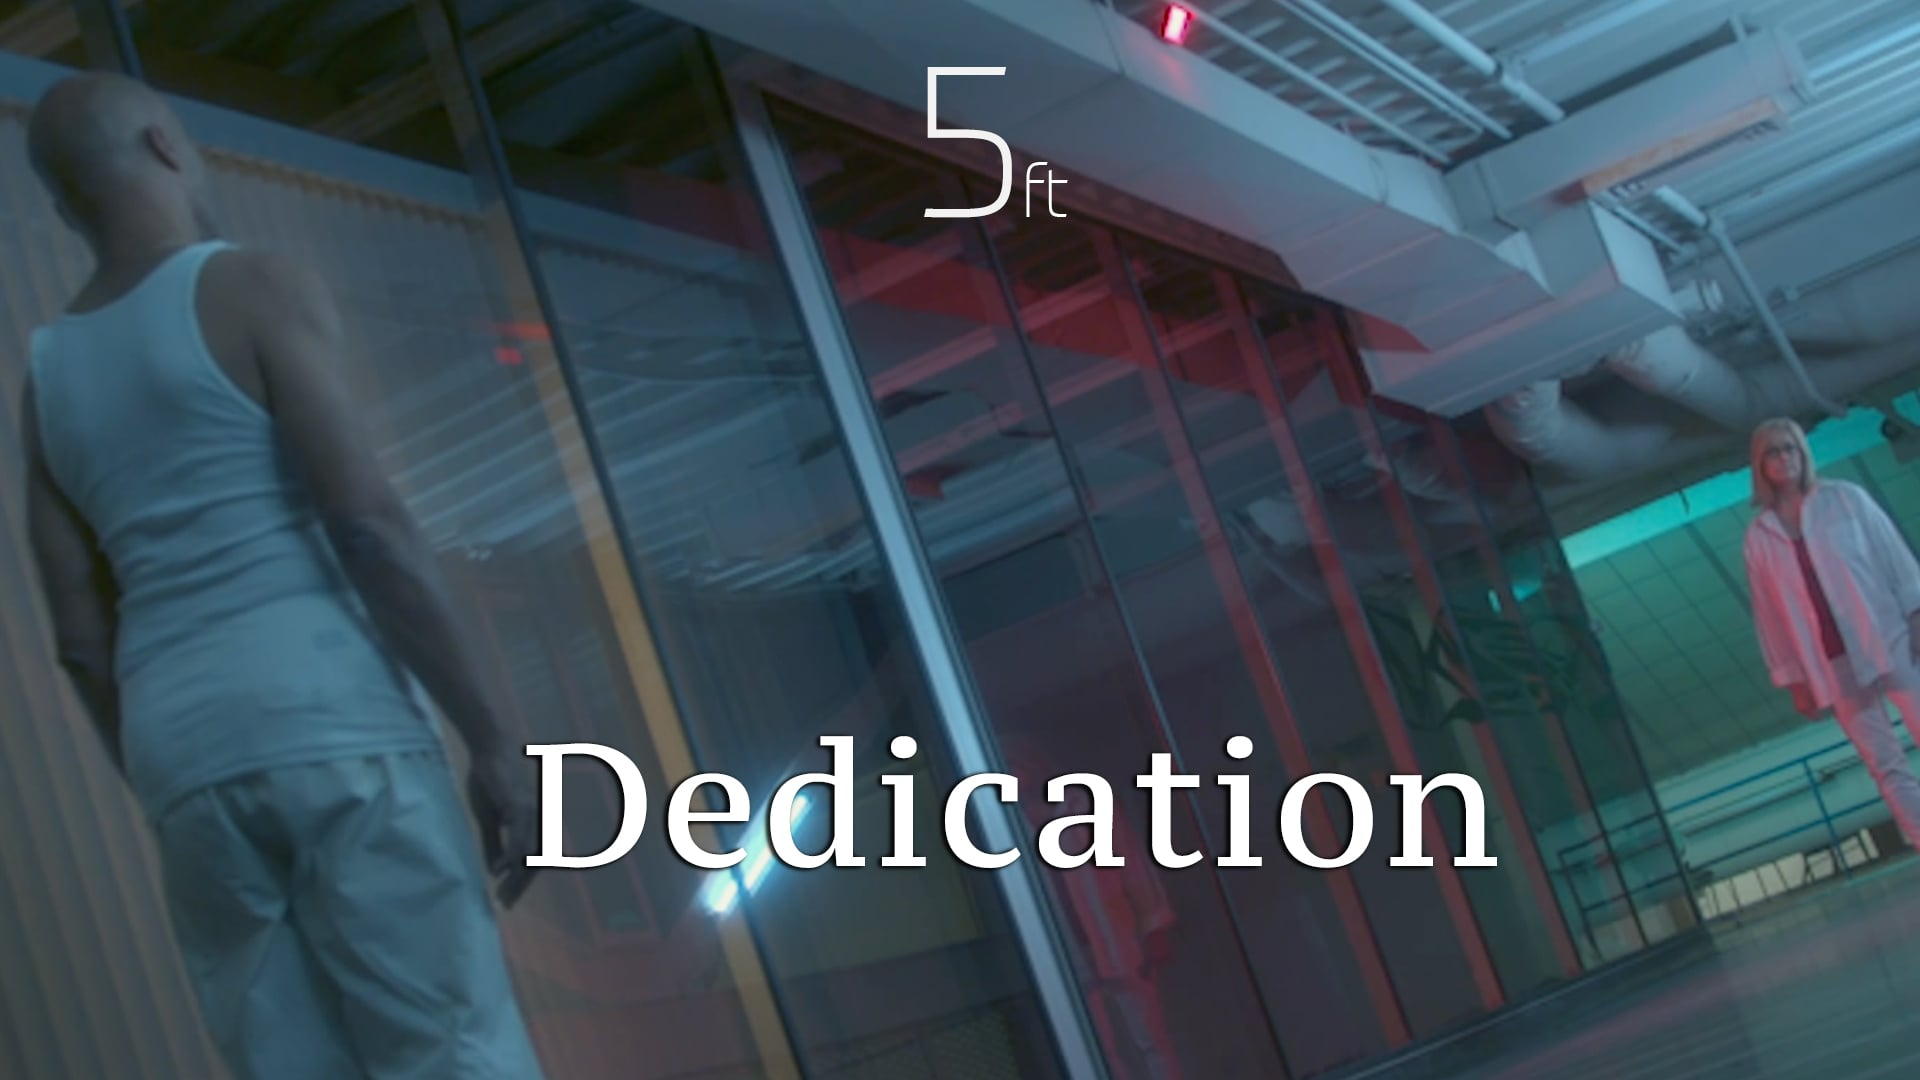 Five Feet Pilot - Dedication